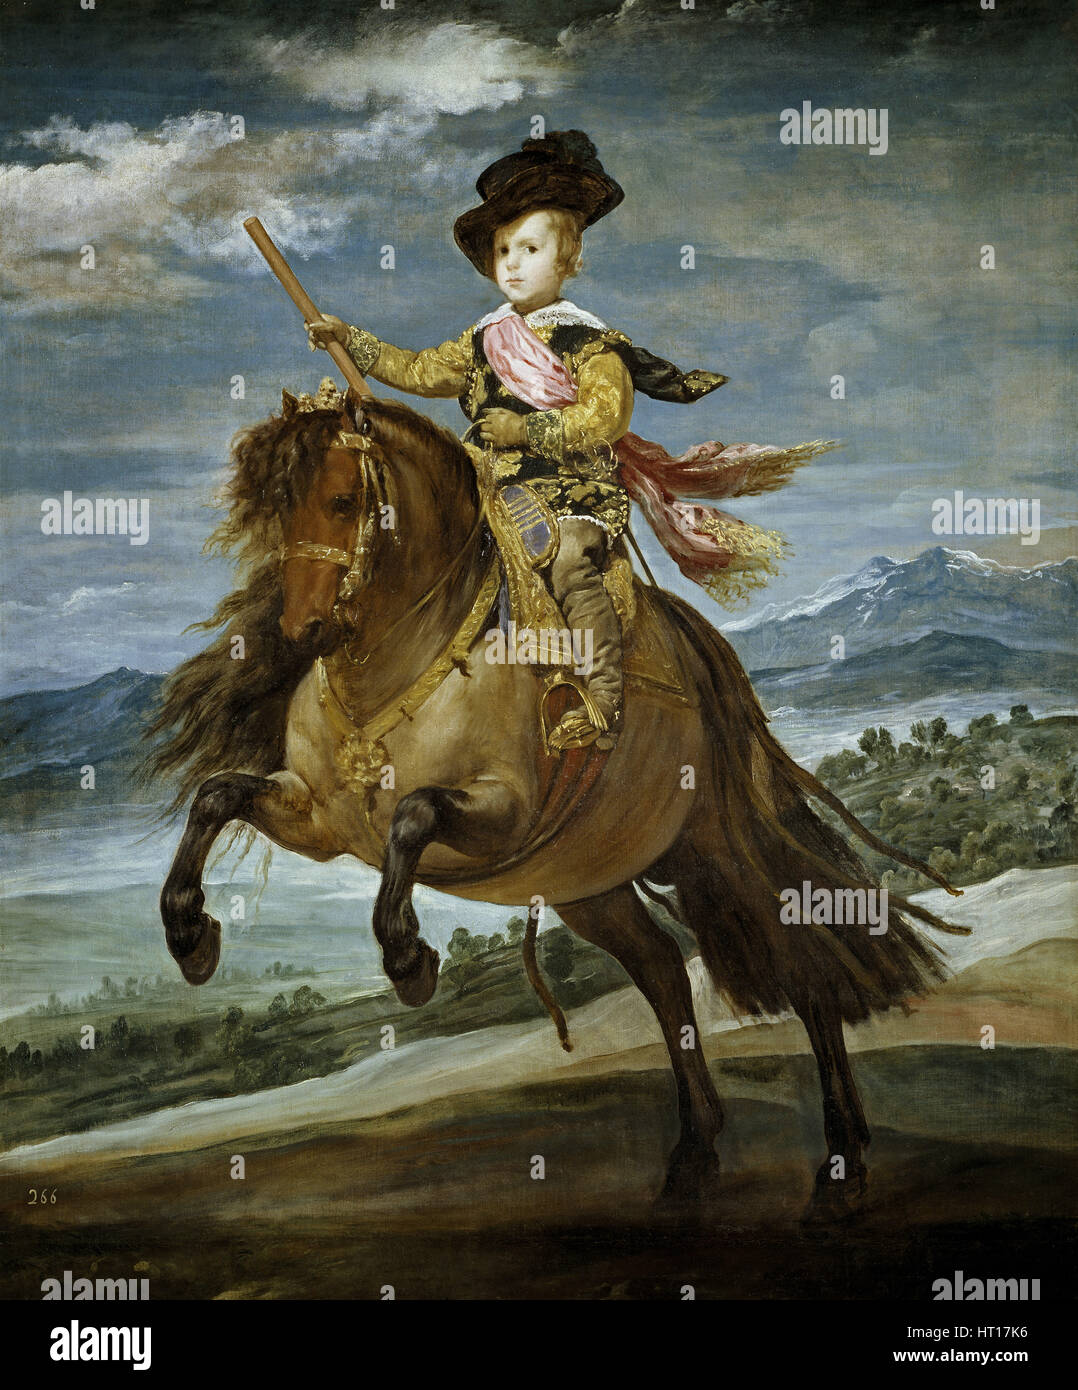 Equestrian Portrait of Prince Balthasar Charles, c. 1635. Artist: Velàzquez, Diego (1599-1660) - Stock Image